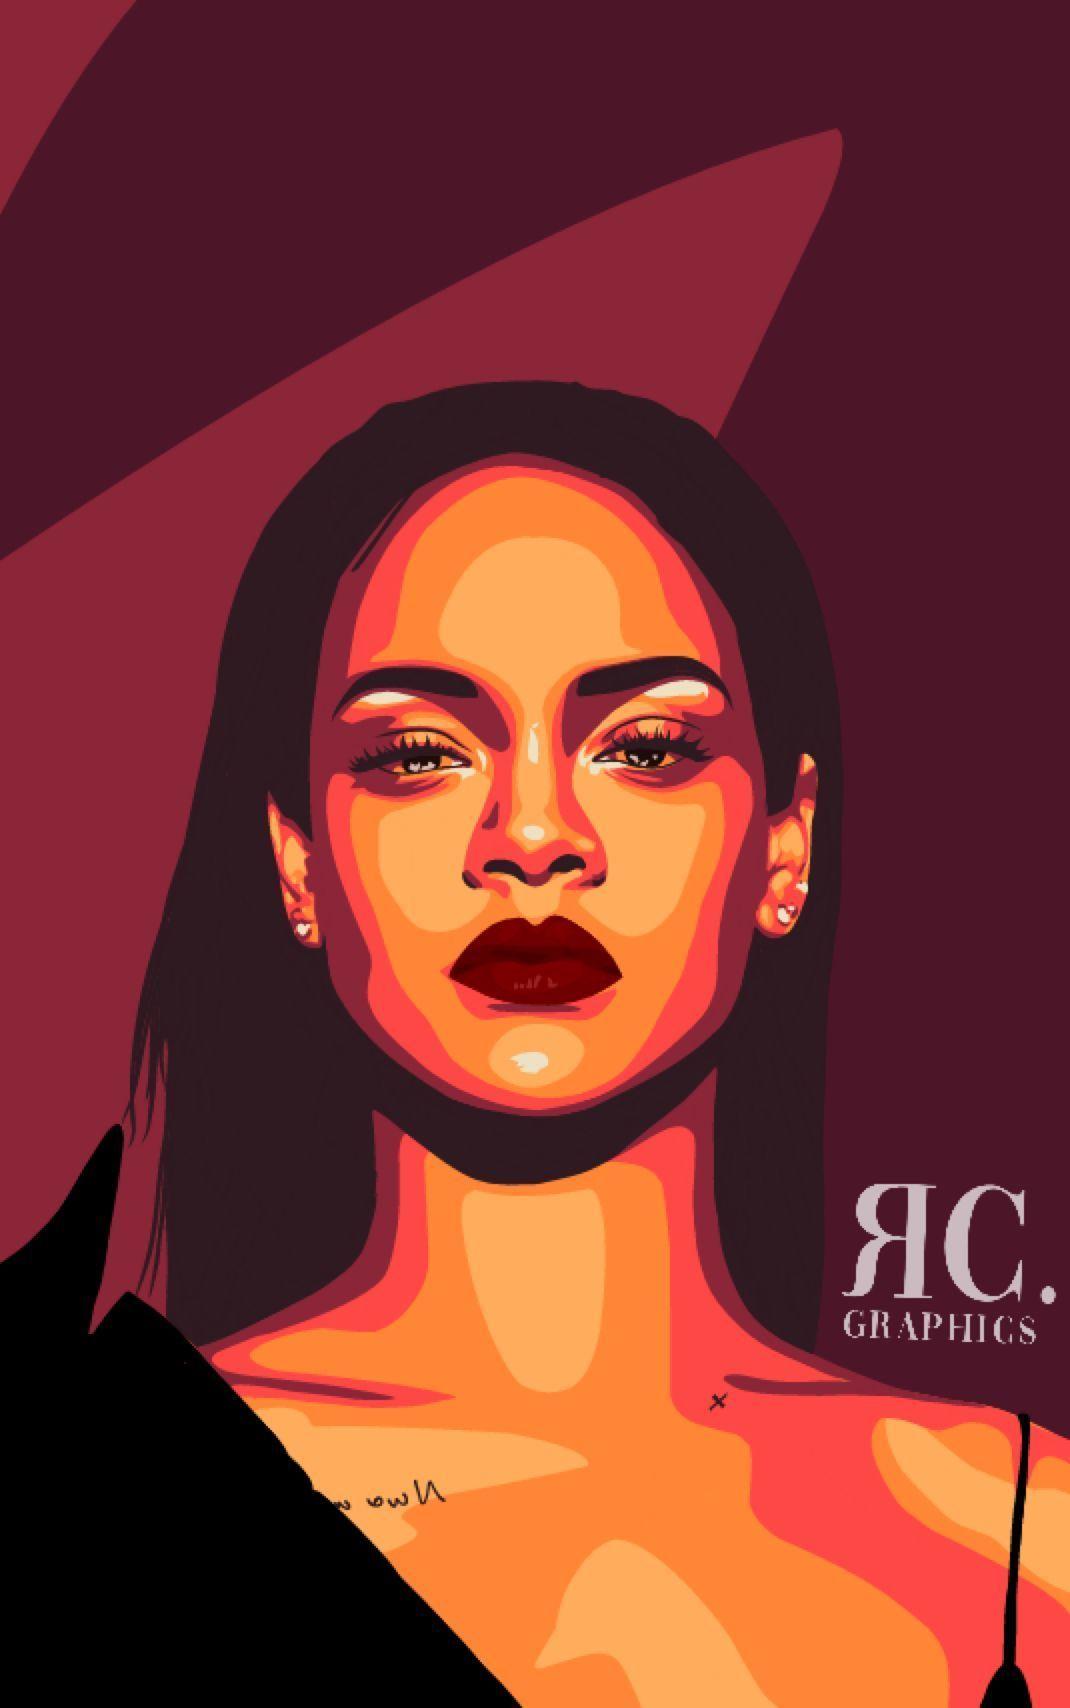 Pop Art Portraits Artpop Grafikdesign Illustration Fisch Illustration